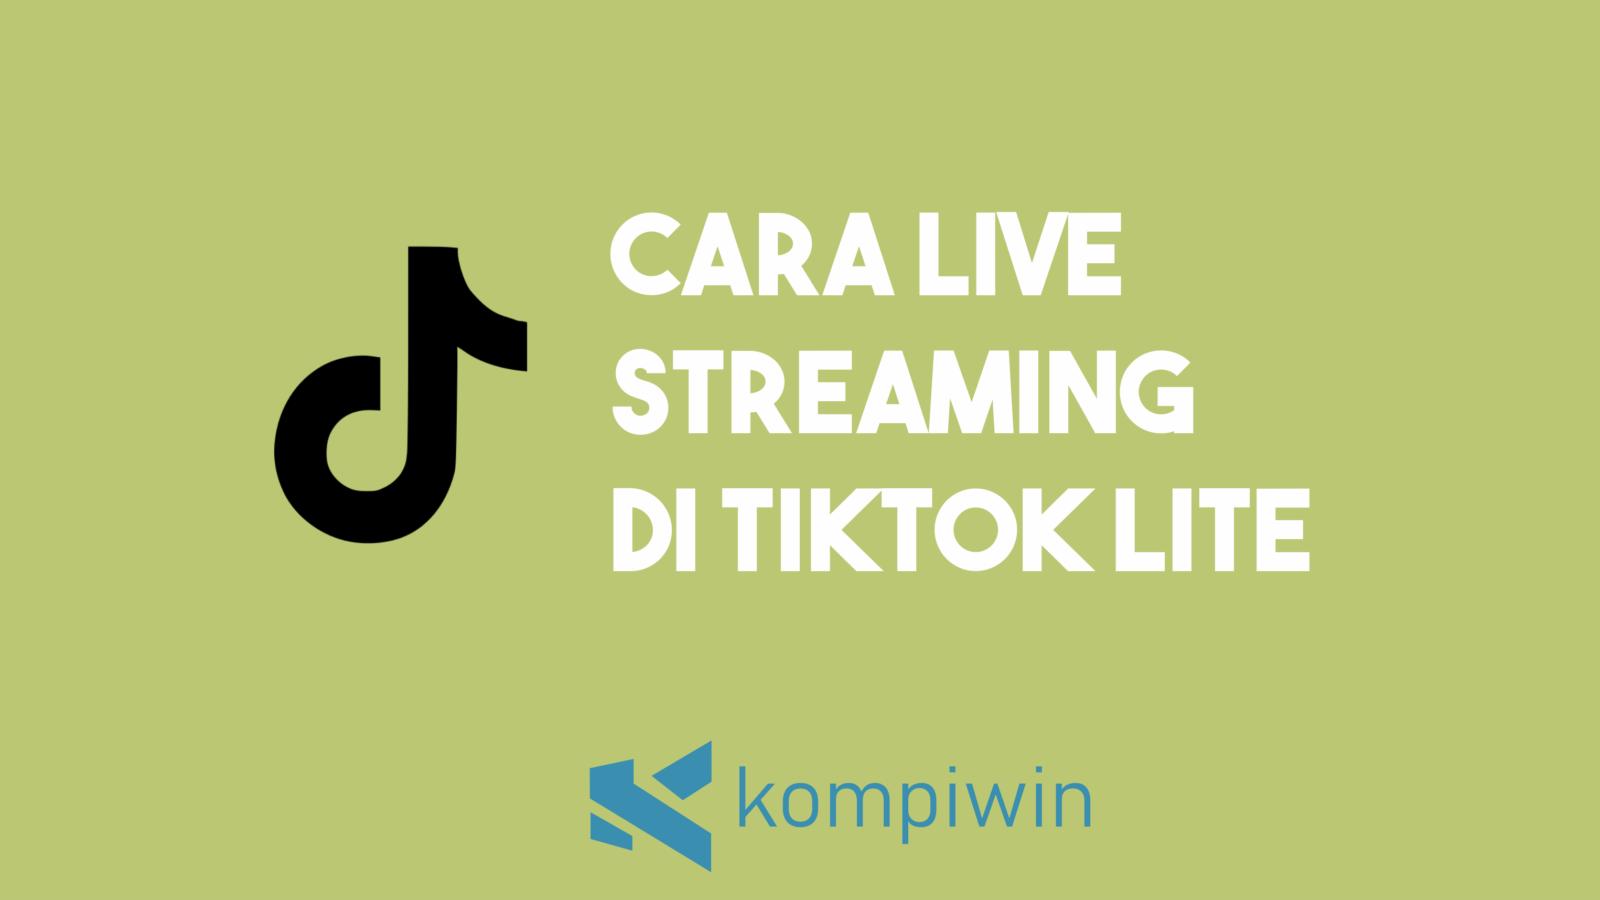 Cara Live Streaming Di TikTok Lite 4